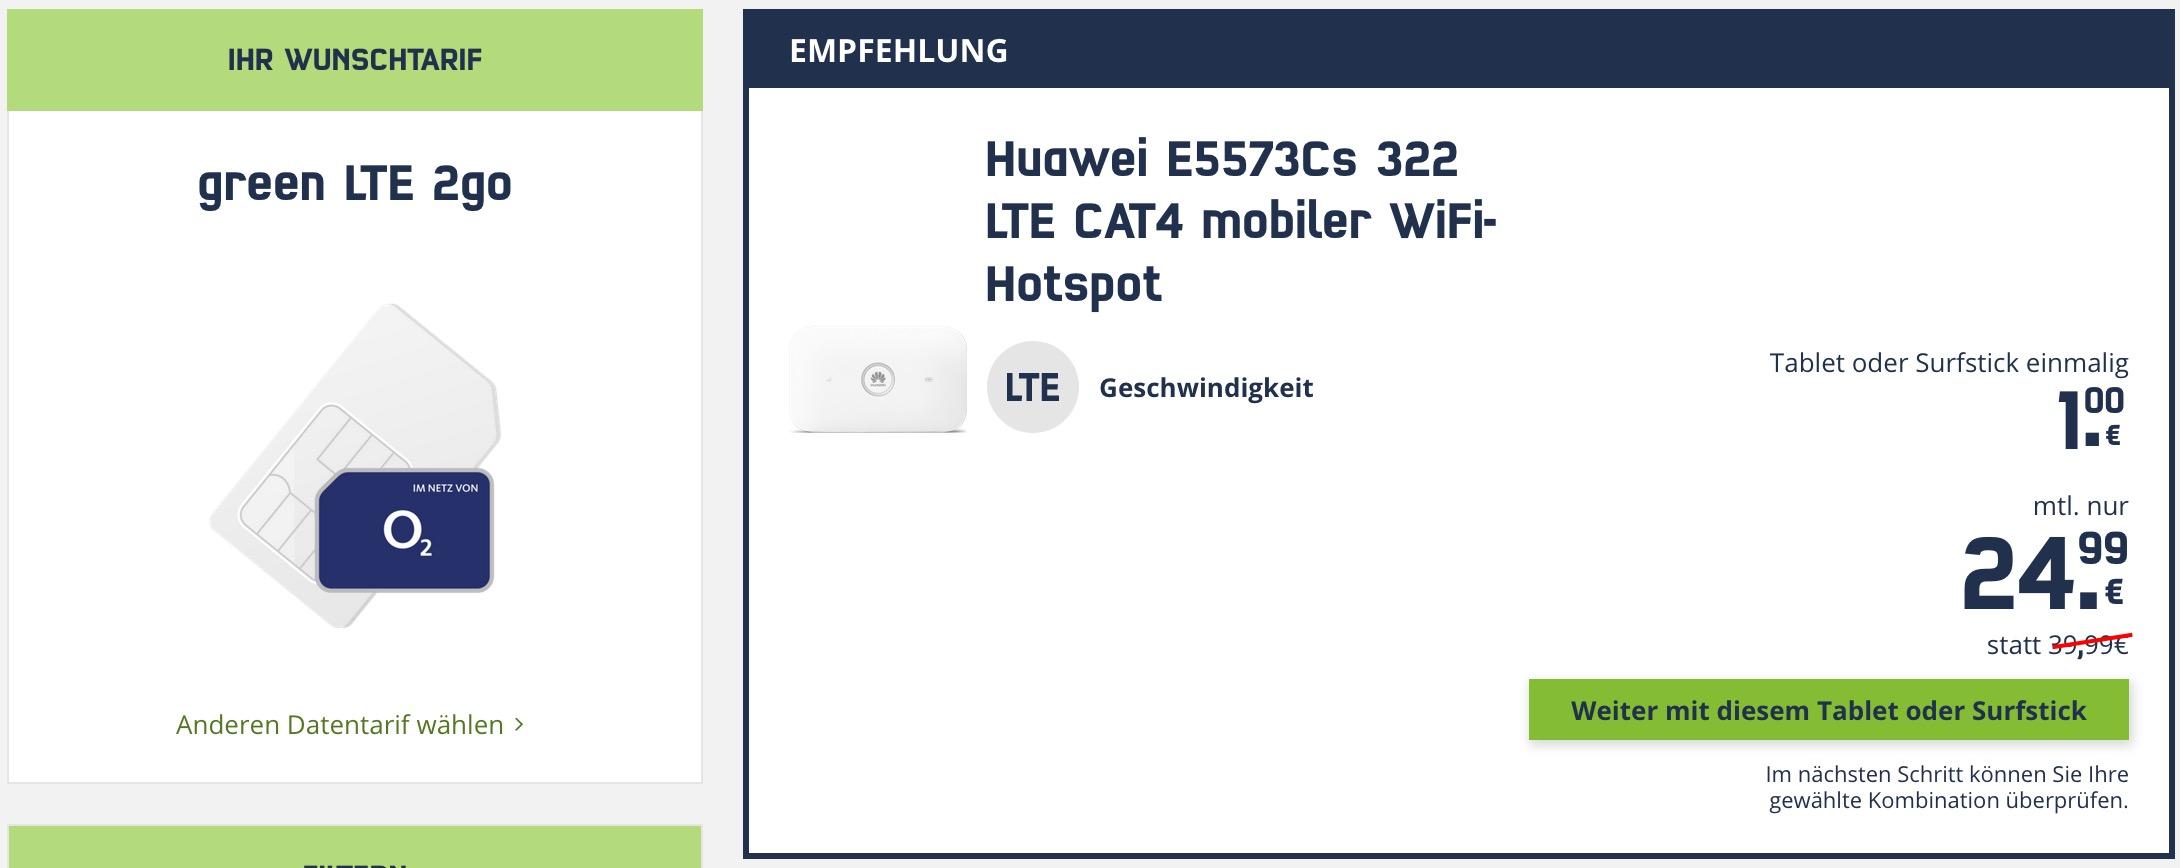 Letzte Chance! Mobilcom-debitel: Unlimitierte LTE